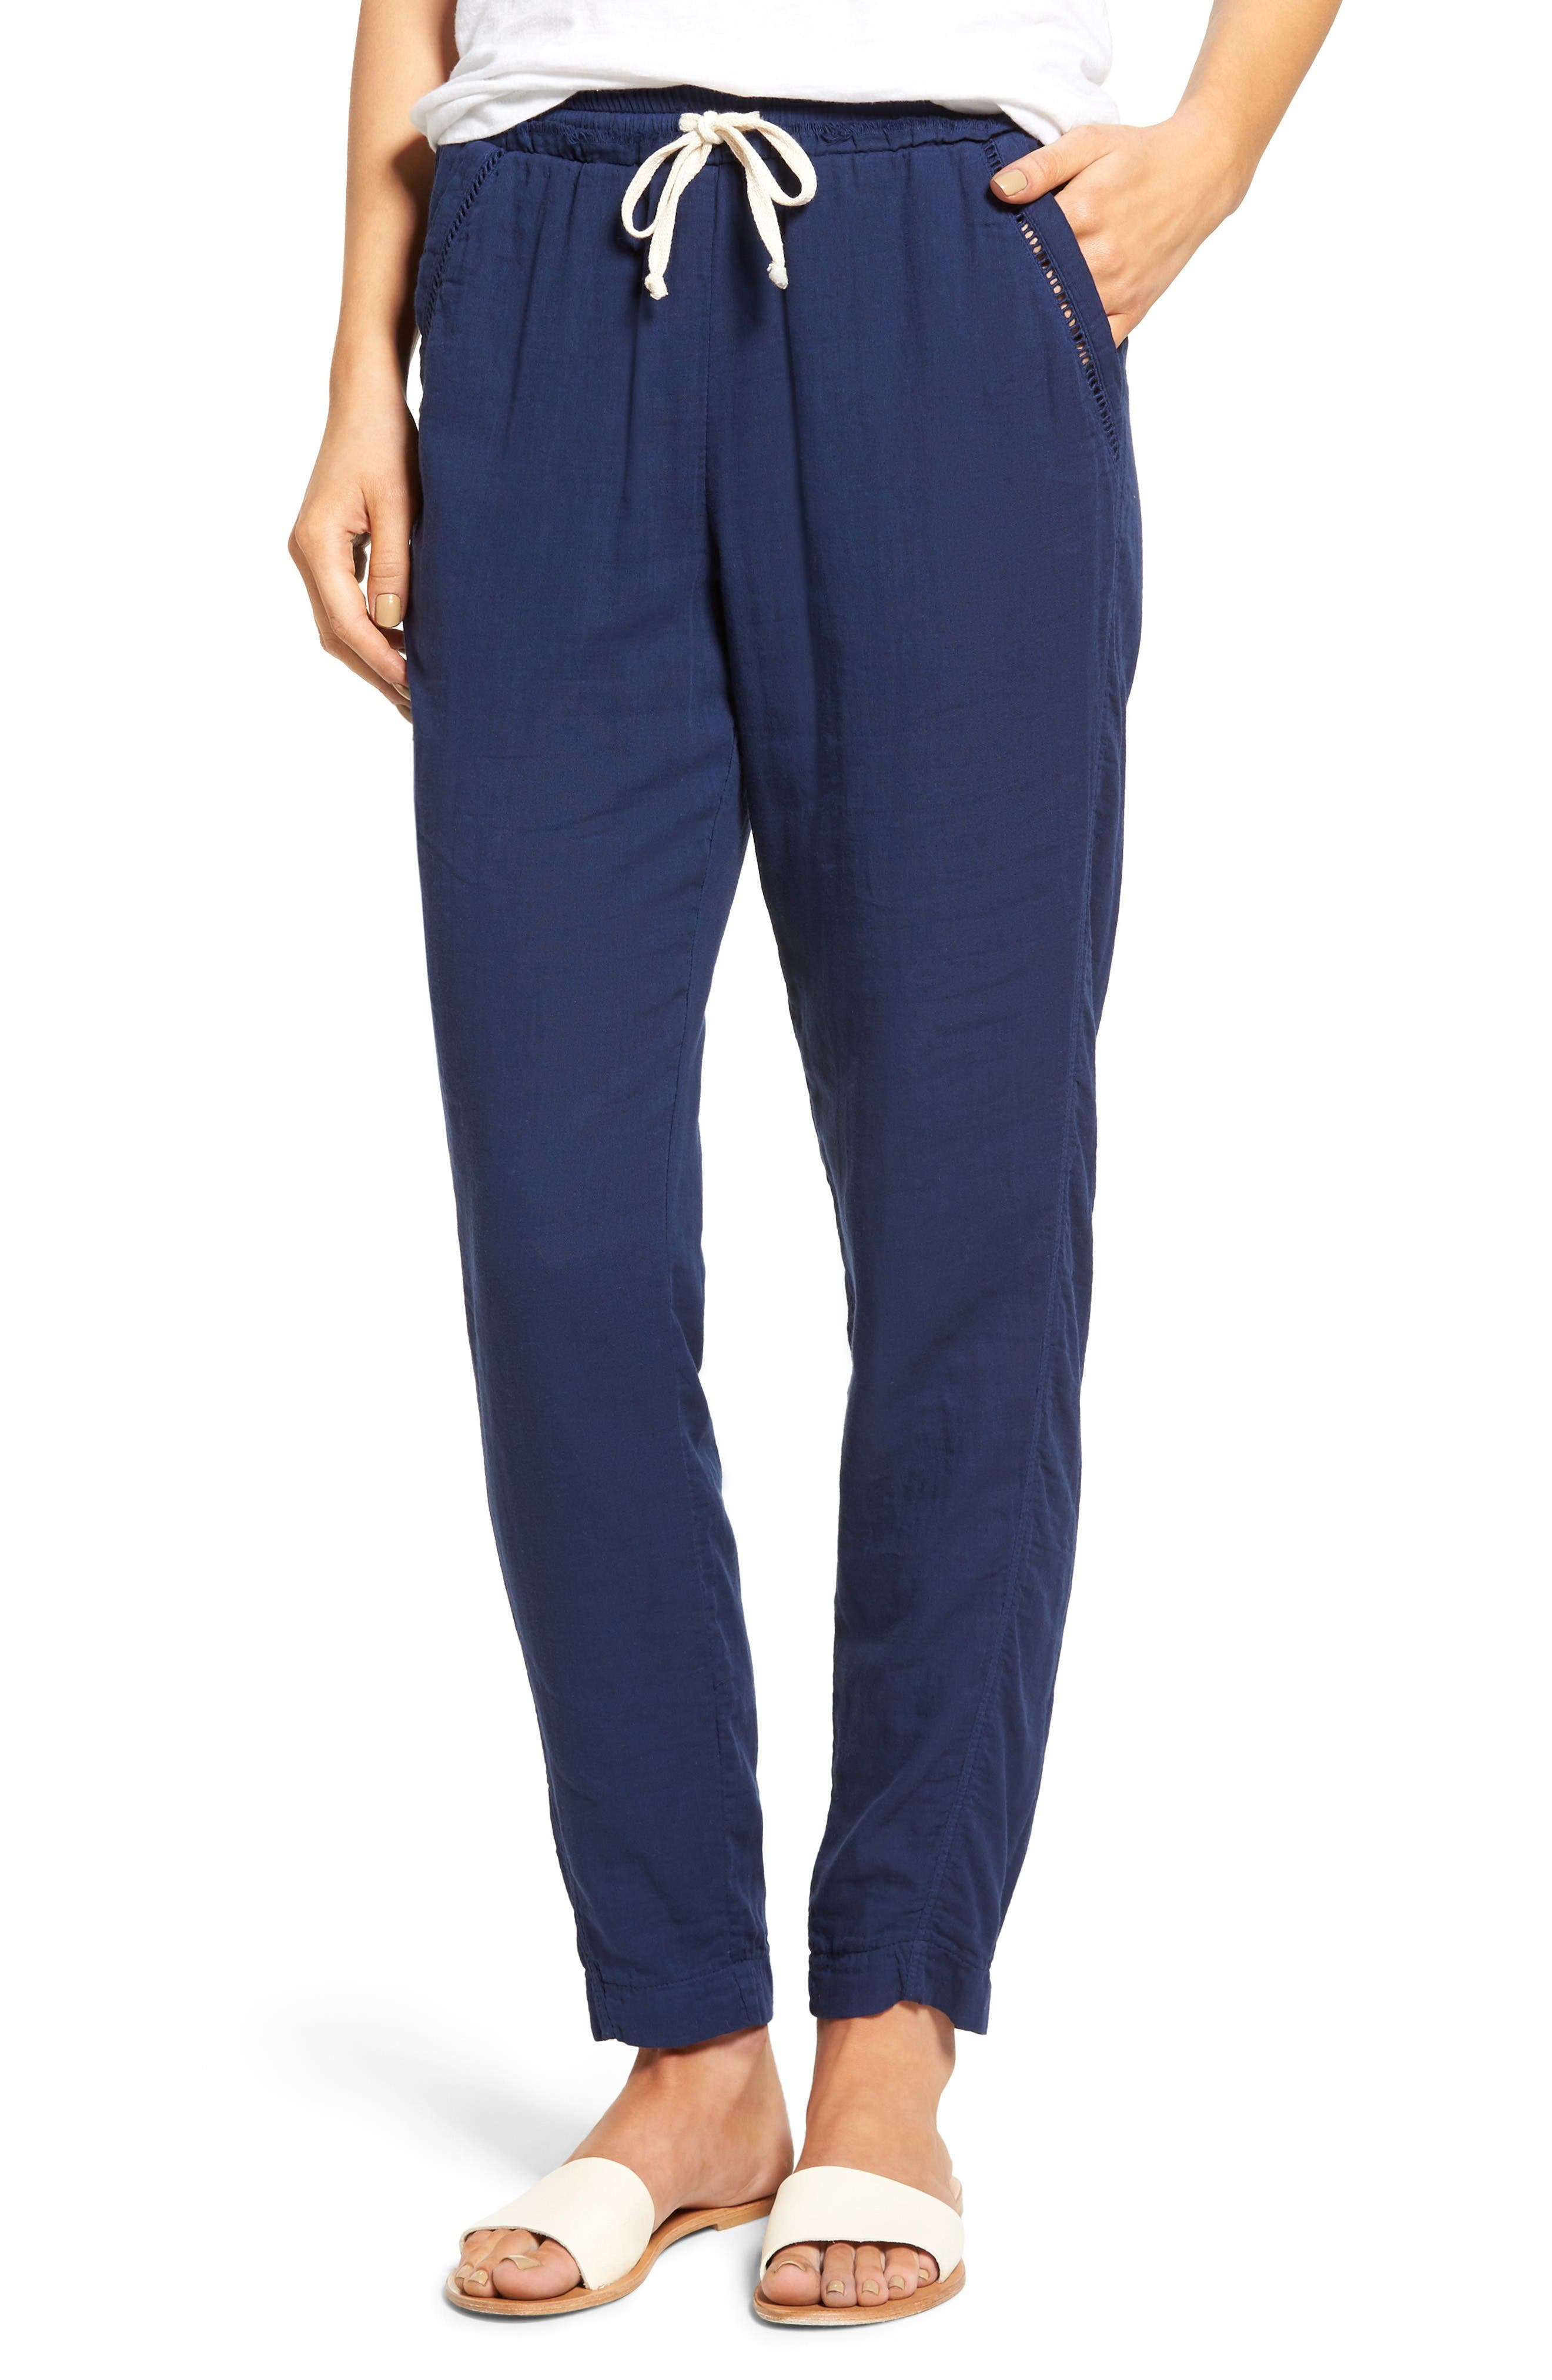 Alternate Image 1 Selected - Splendid Double Cloth Cotton Pants